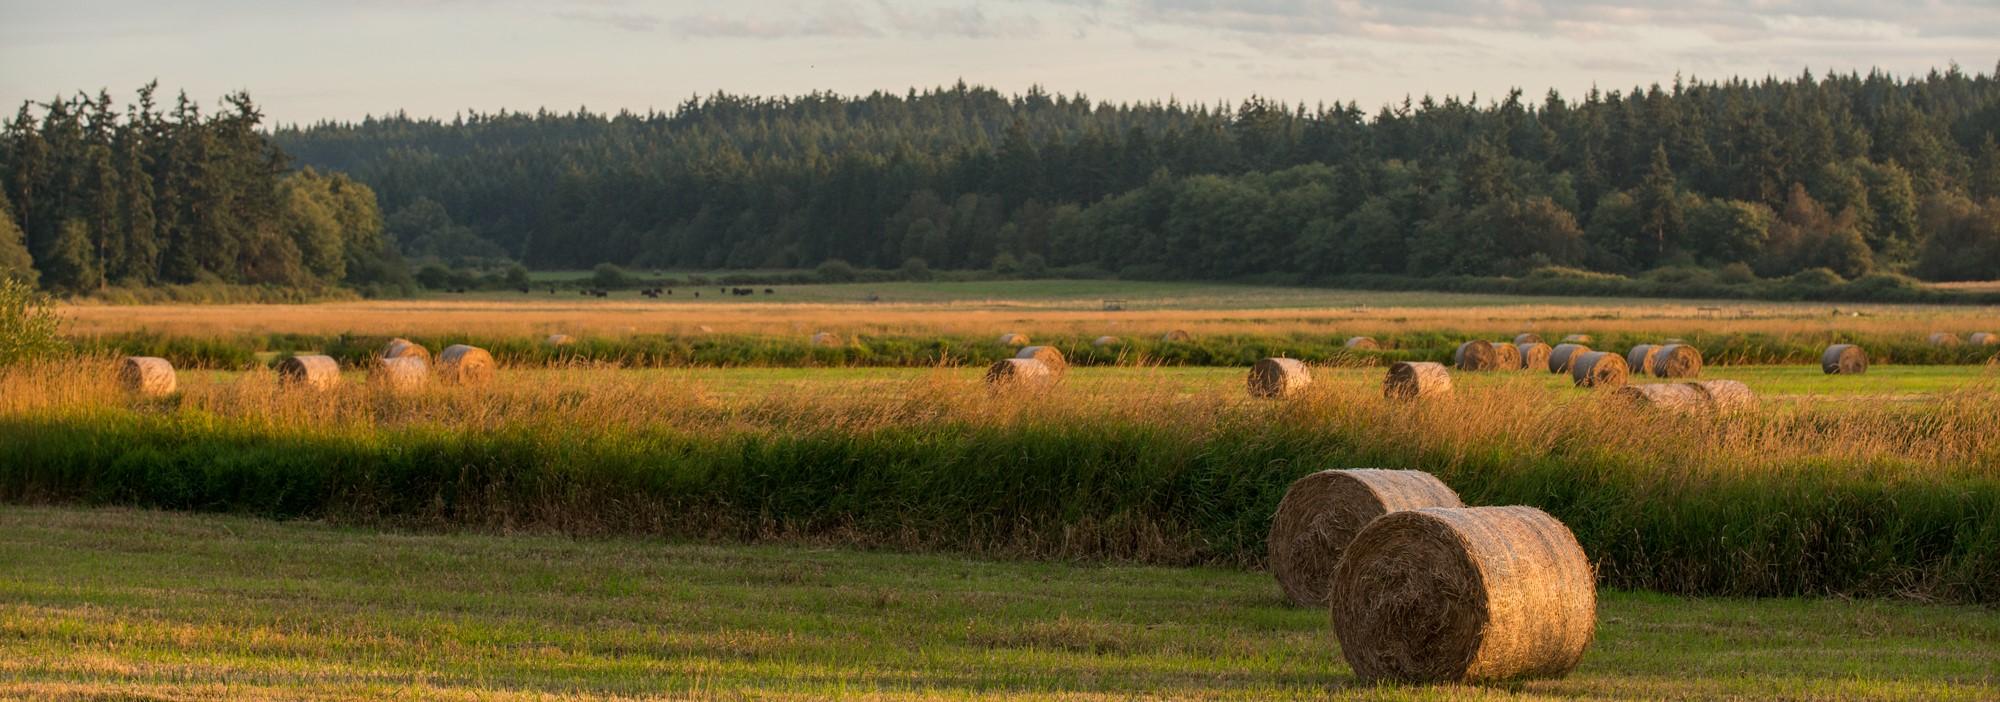 lopez island hay field harvest farm farming pastoral